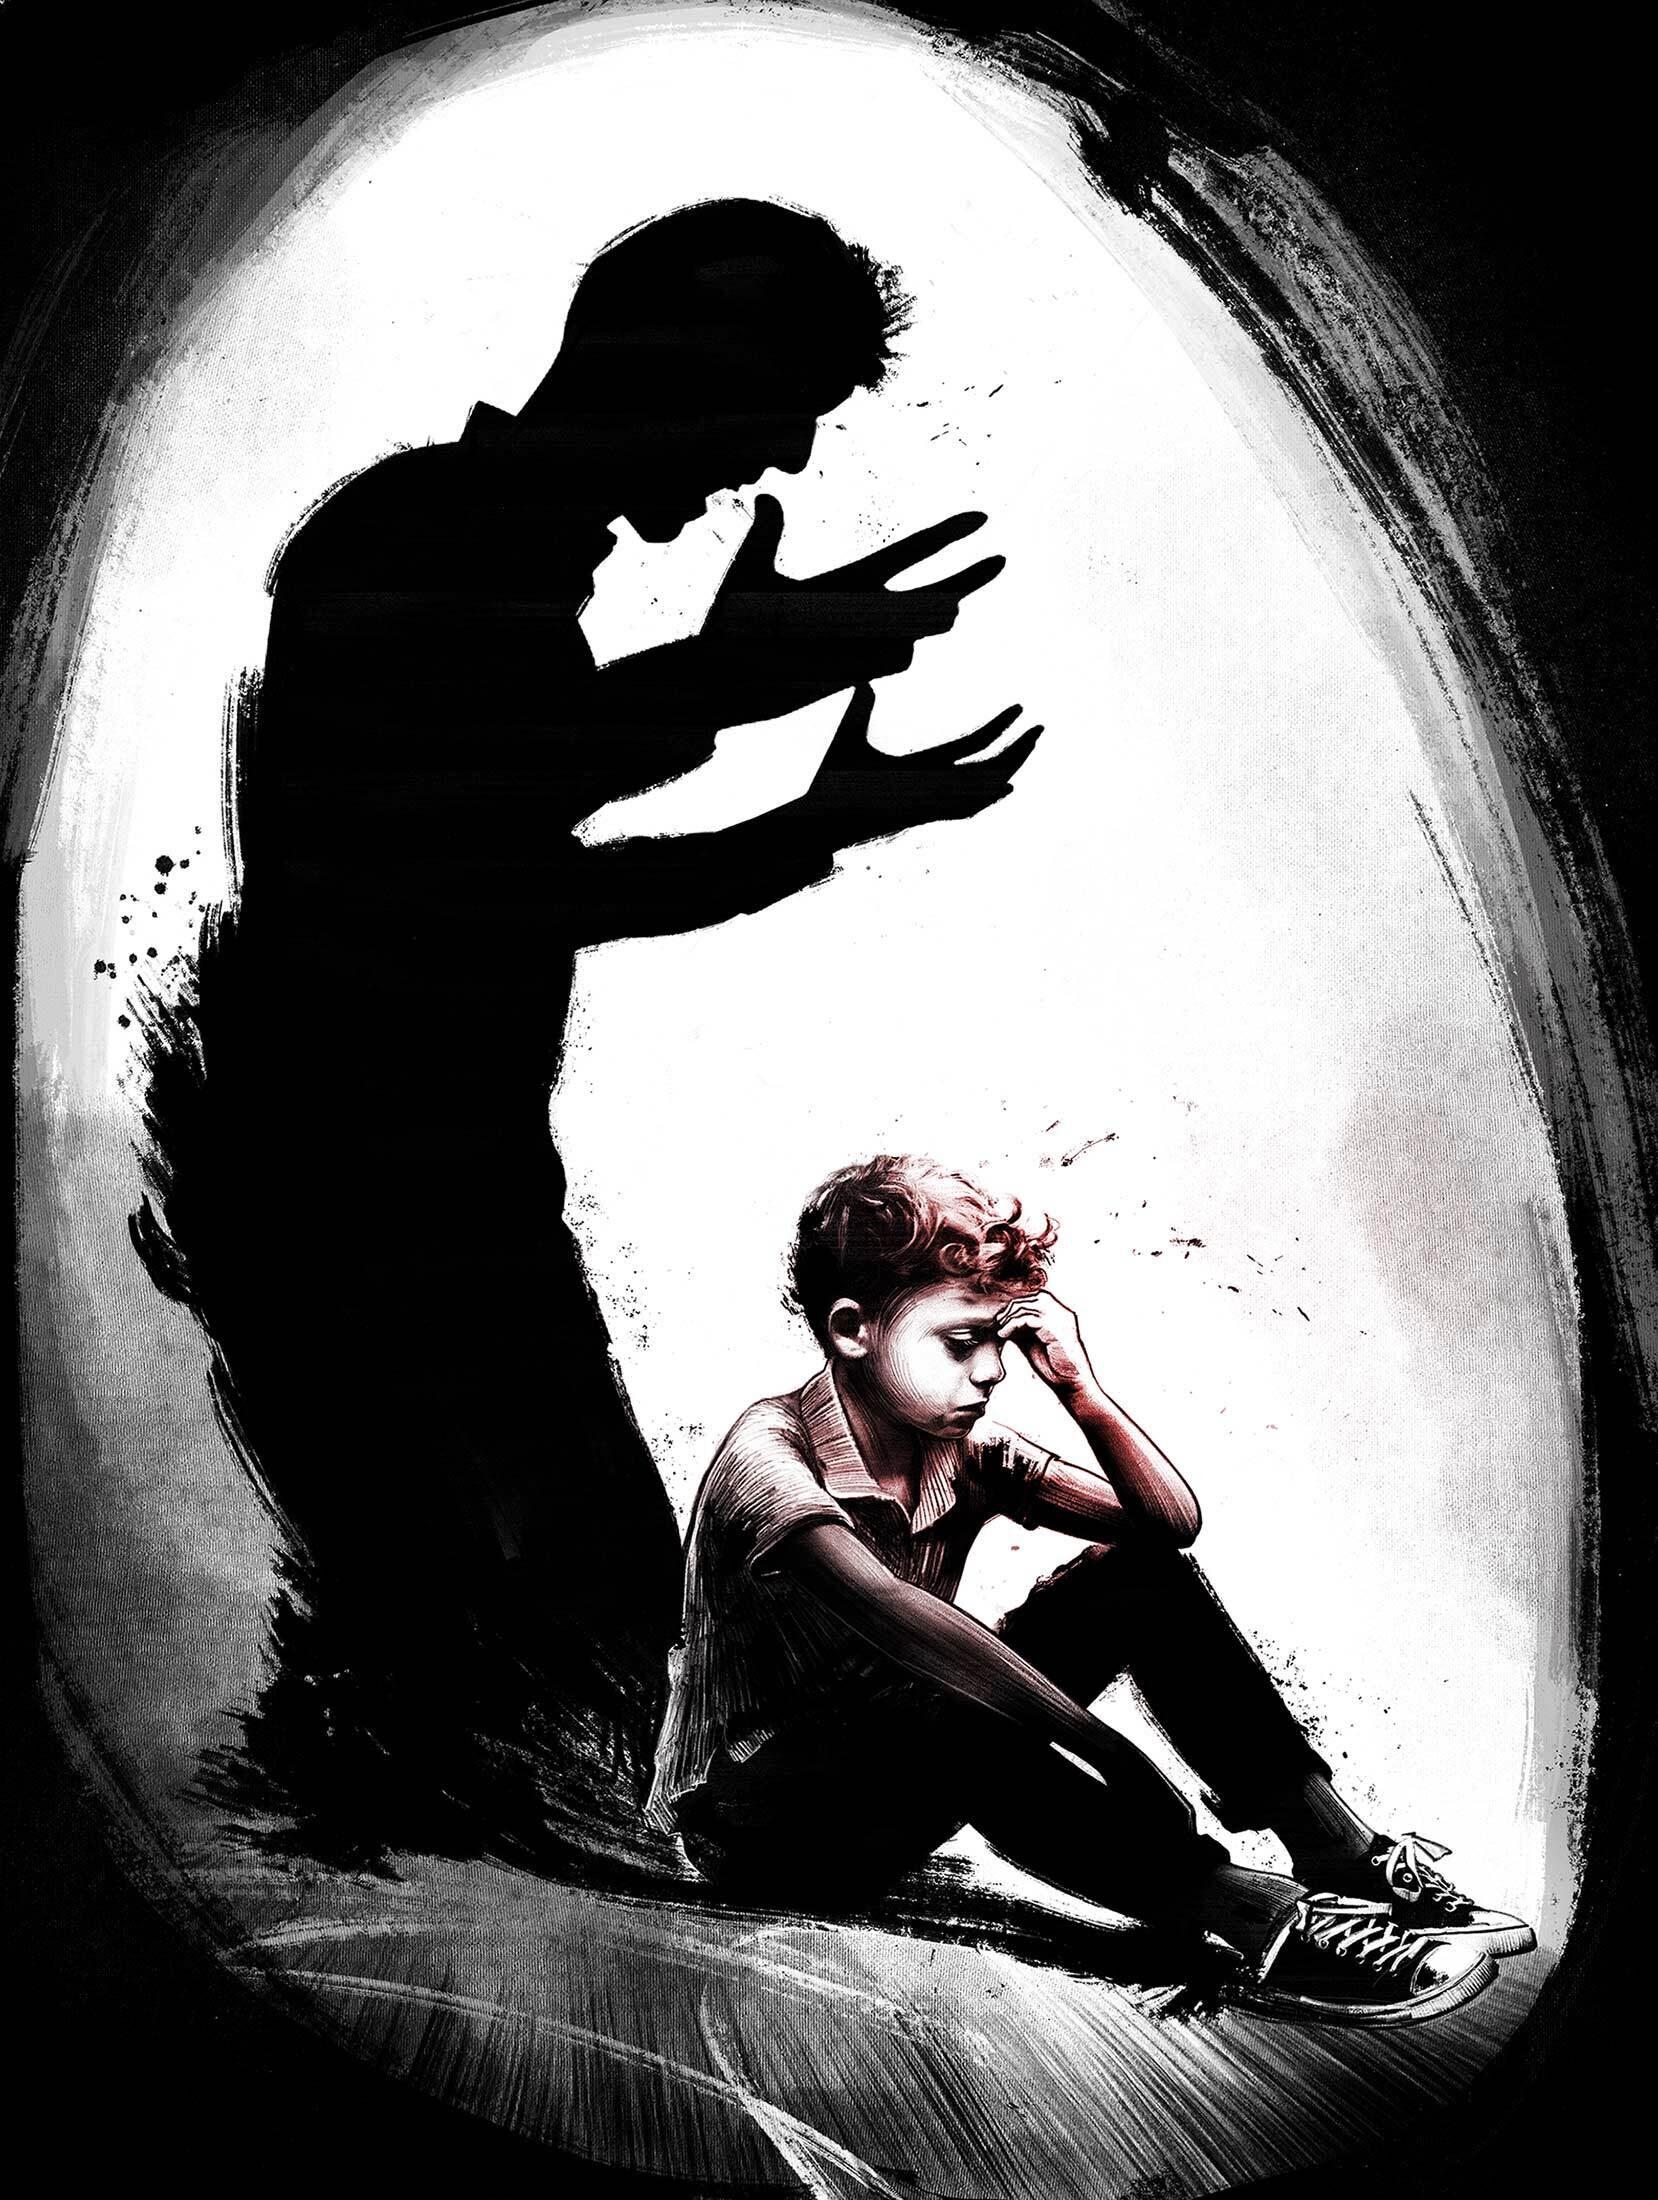 Psychological violence editotorial illustration - Kornel Illustration   Kornel Stadler portfolio